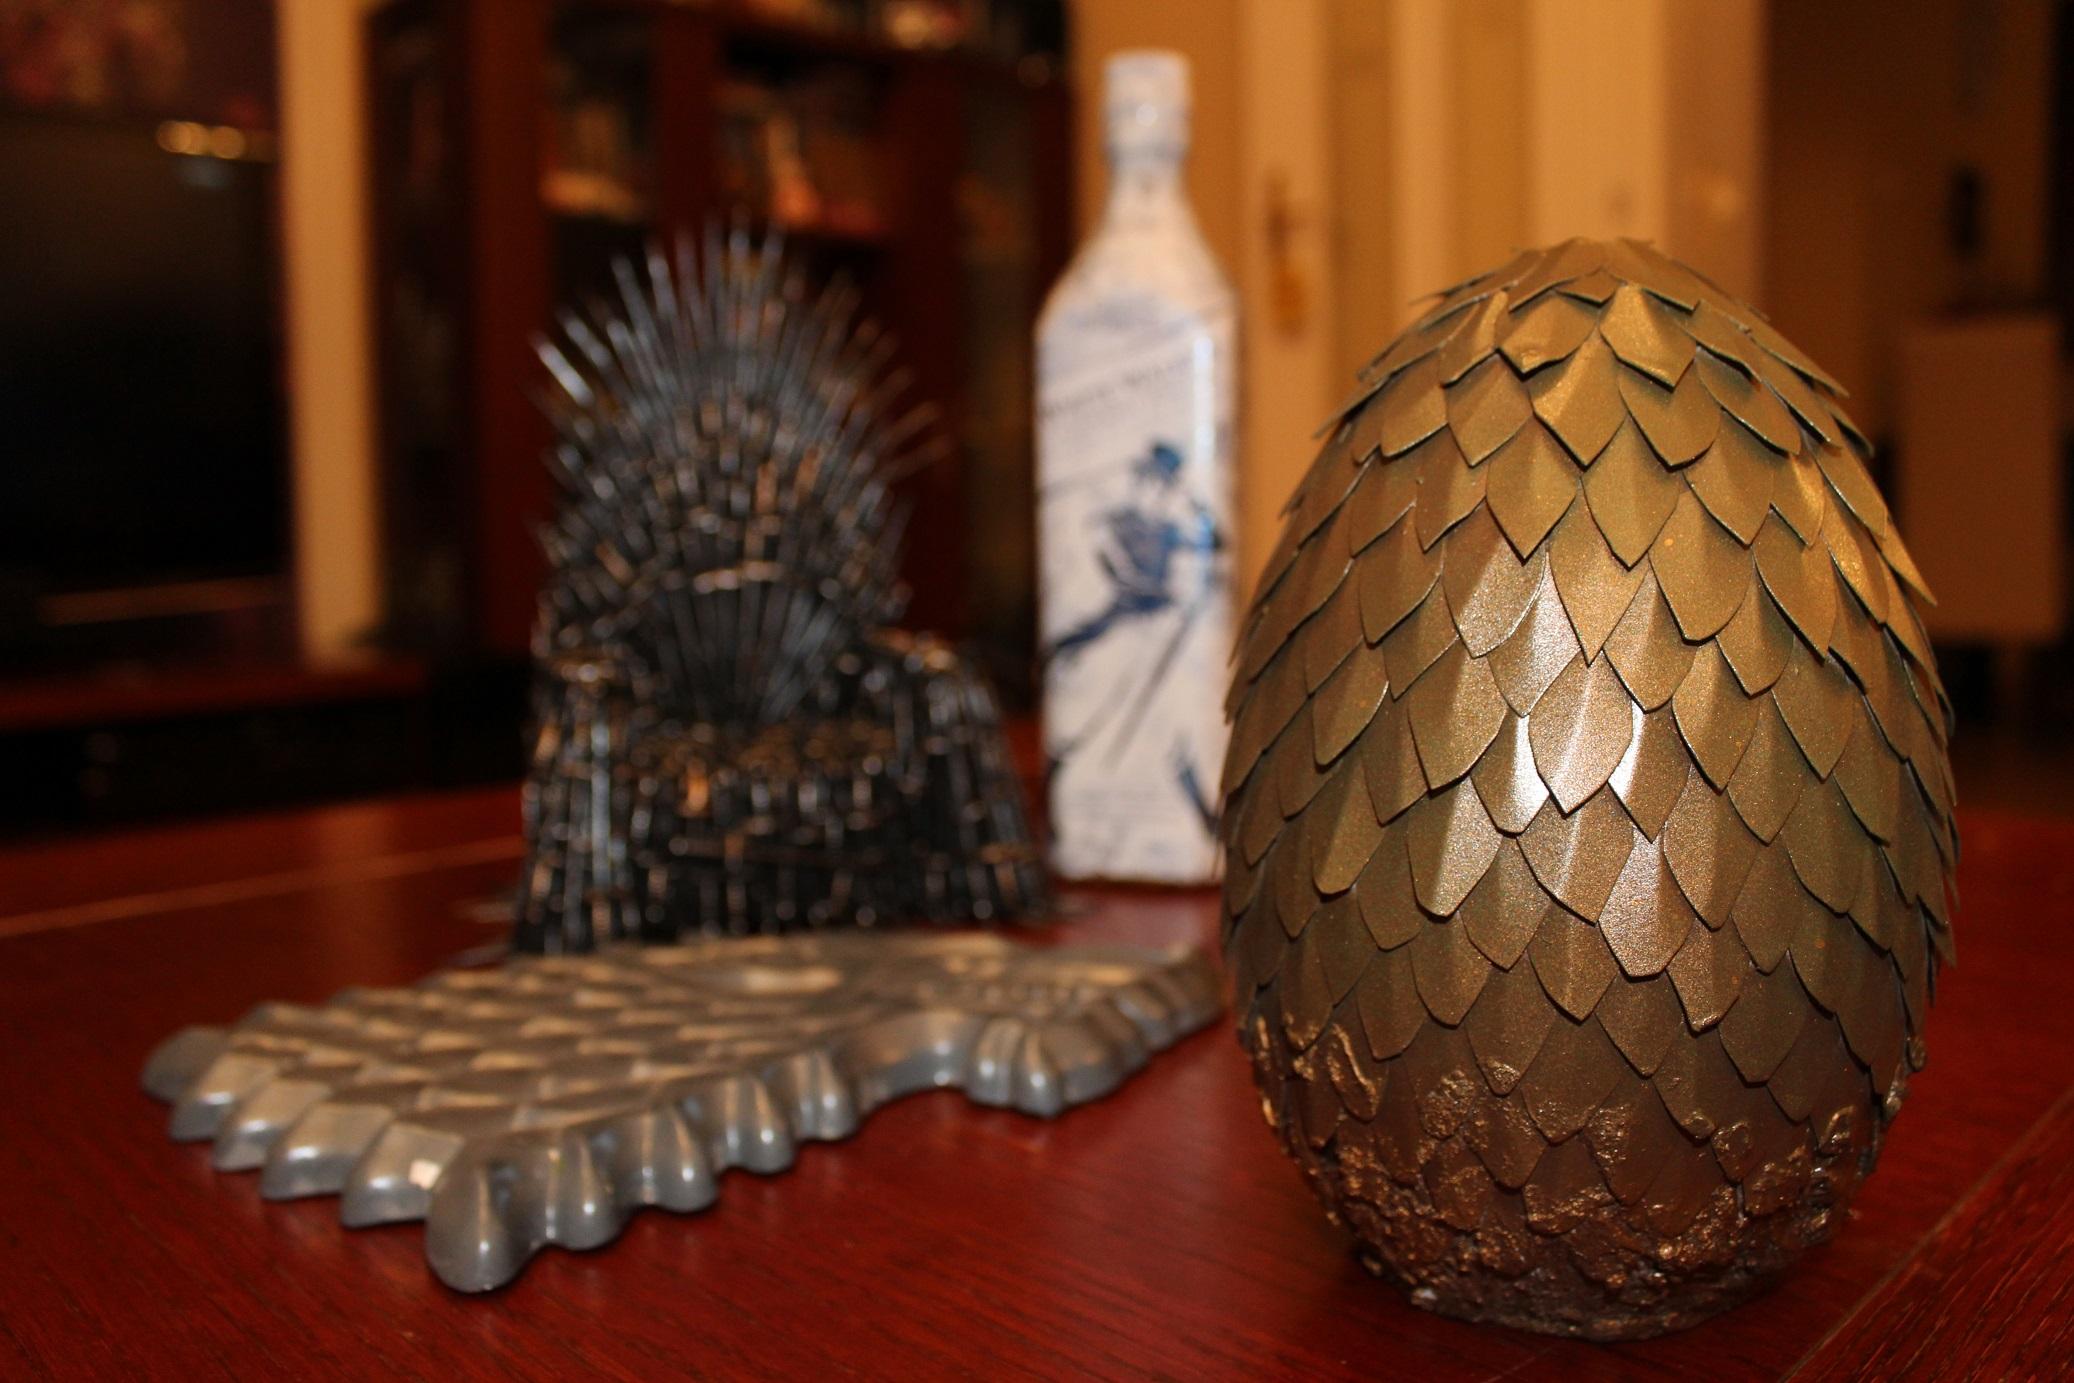 szmk_diy_tronok_harca_sarkanytojas_drogon_targaryen_danerys_dragonegg_game_of_thrones_hbo_winter_is_coming_westeros_csinald_magad_17.JPG